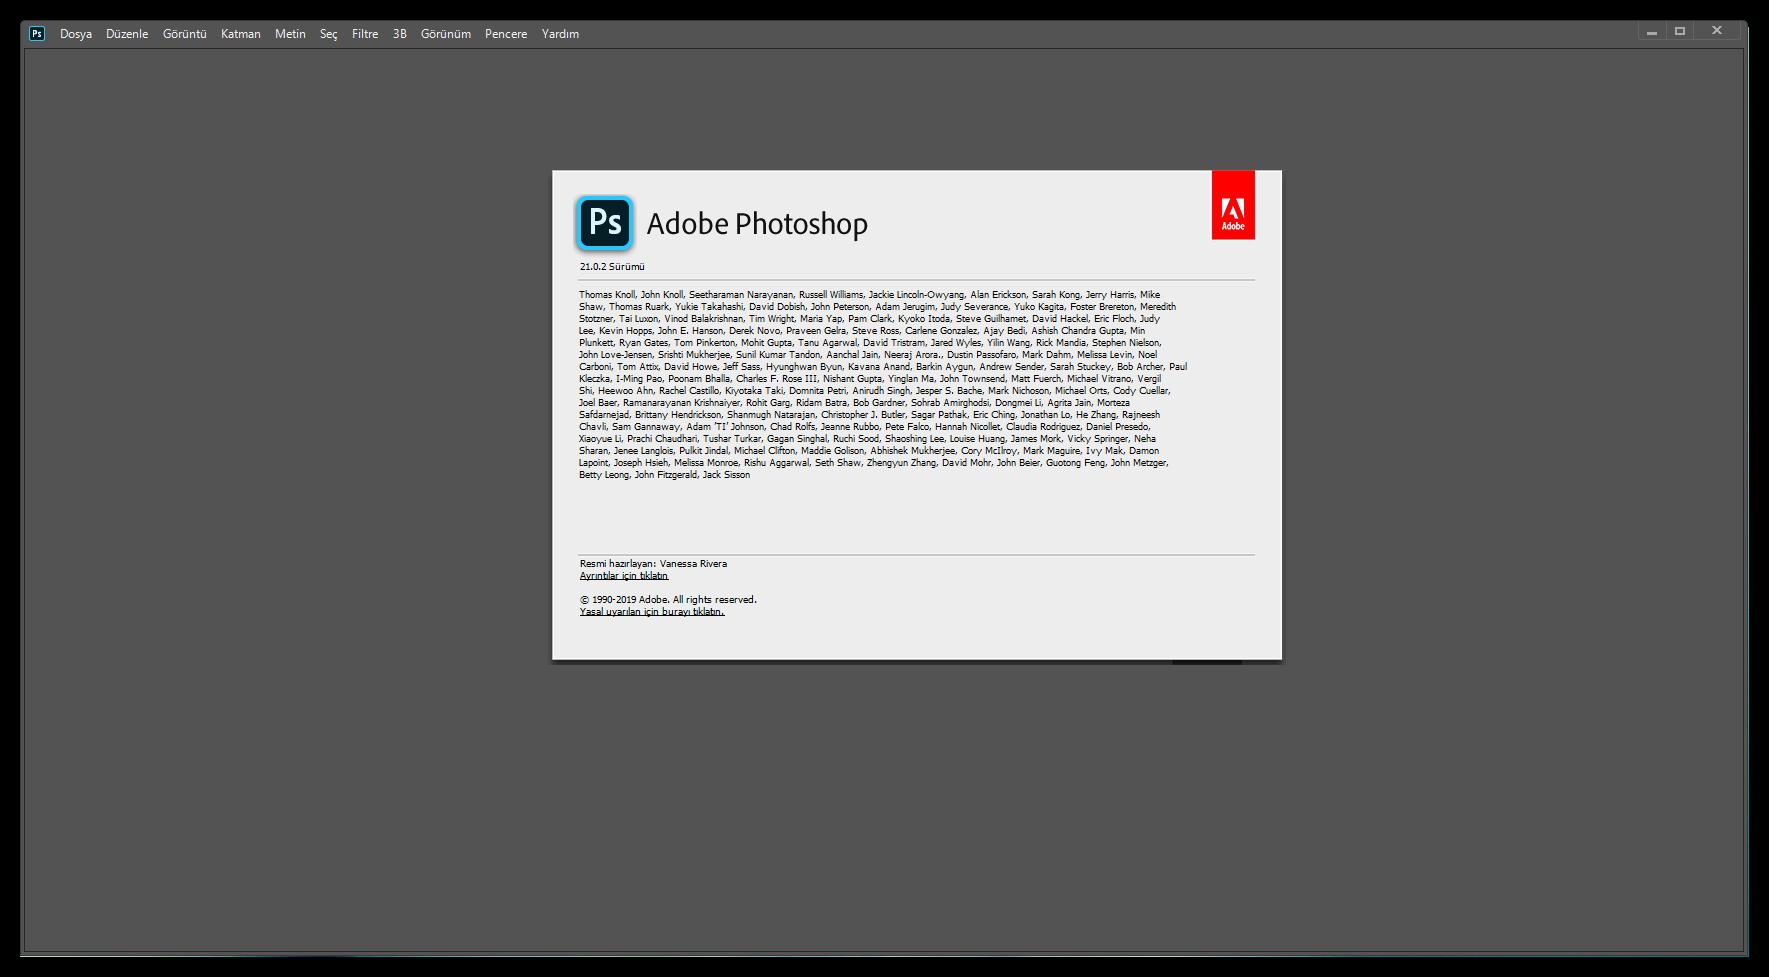 Adobe Photoshop 2020 21.0.2.57 (x64) | Katılımsız